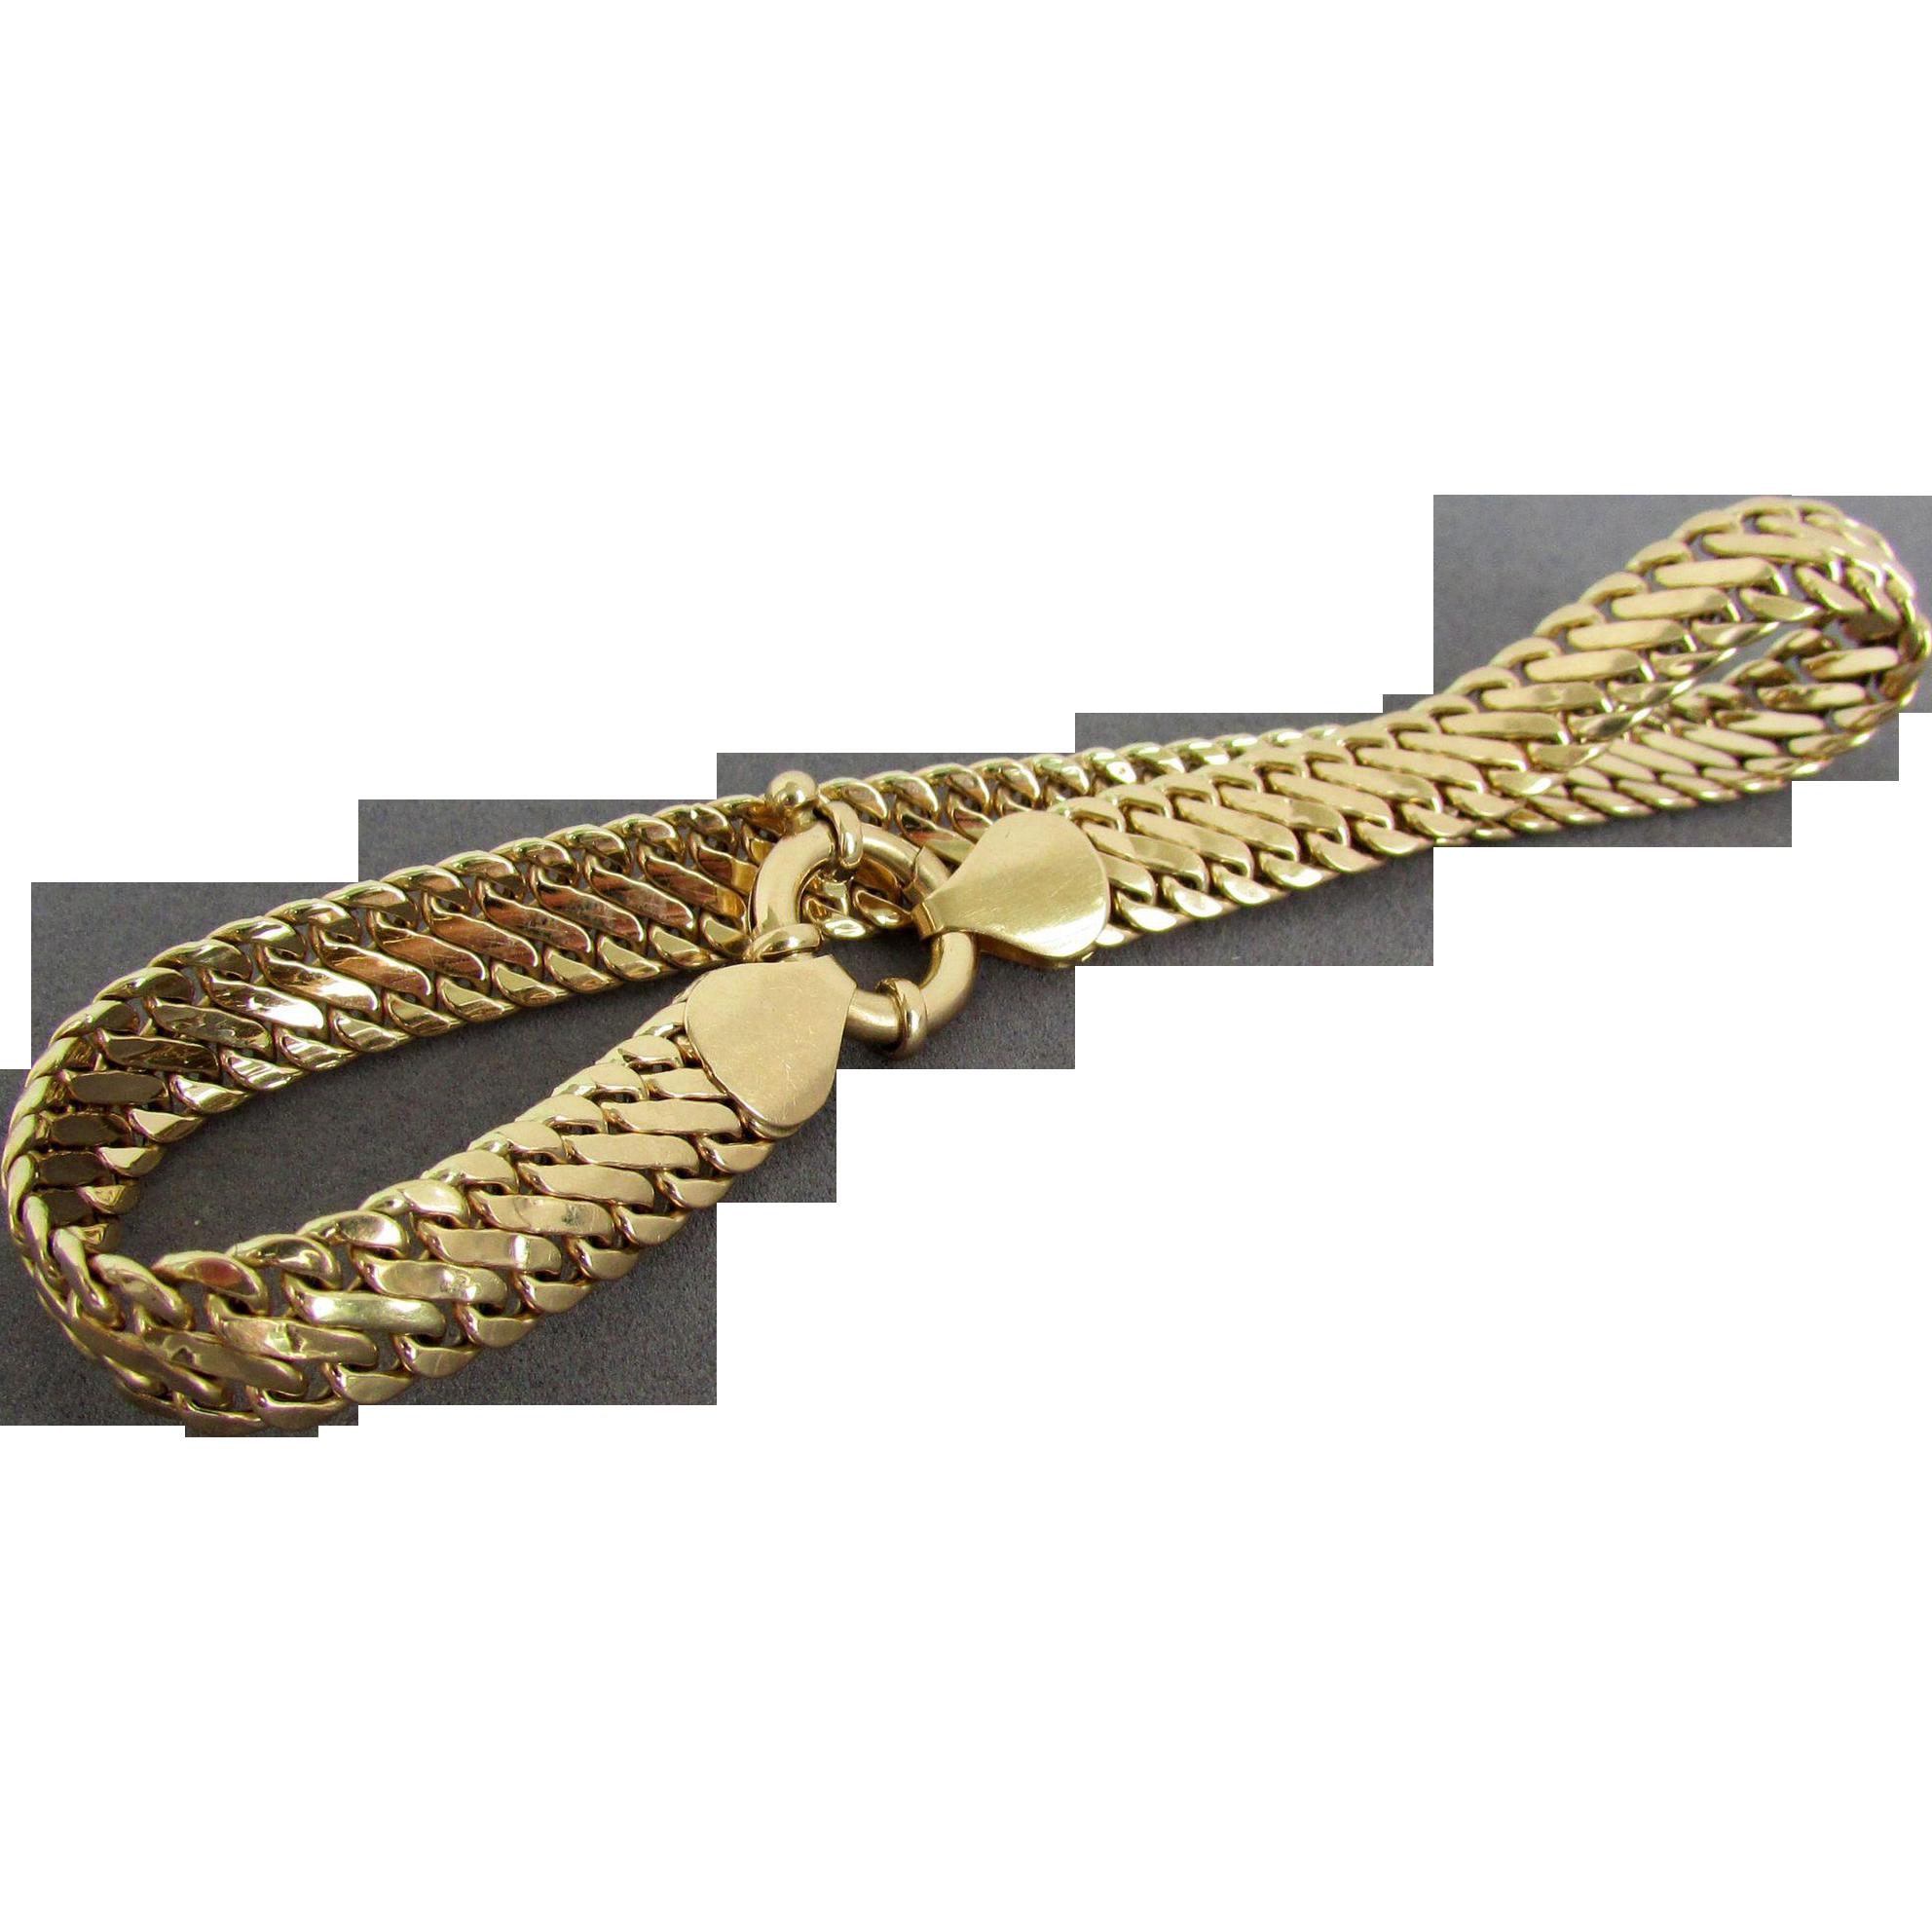 7.1 Grams, 14K Italian Yellow Gold Bracelet, 8 1/4 Inches Long ...